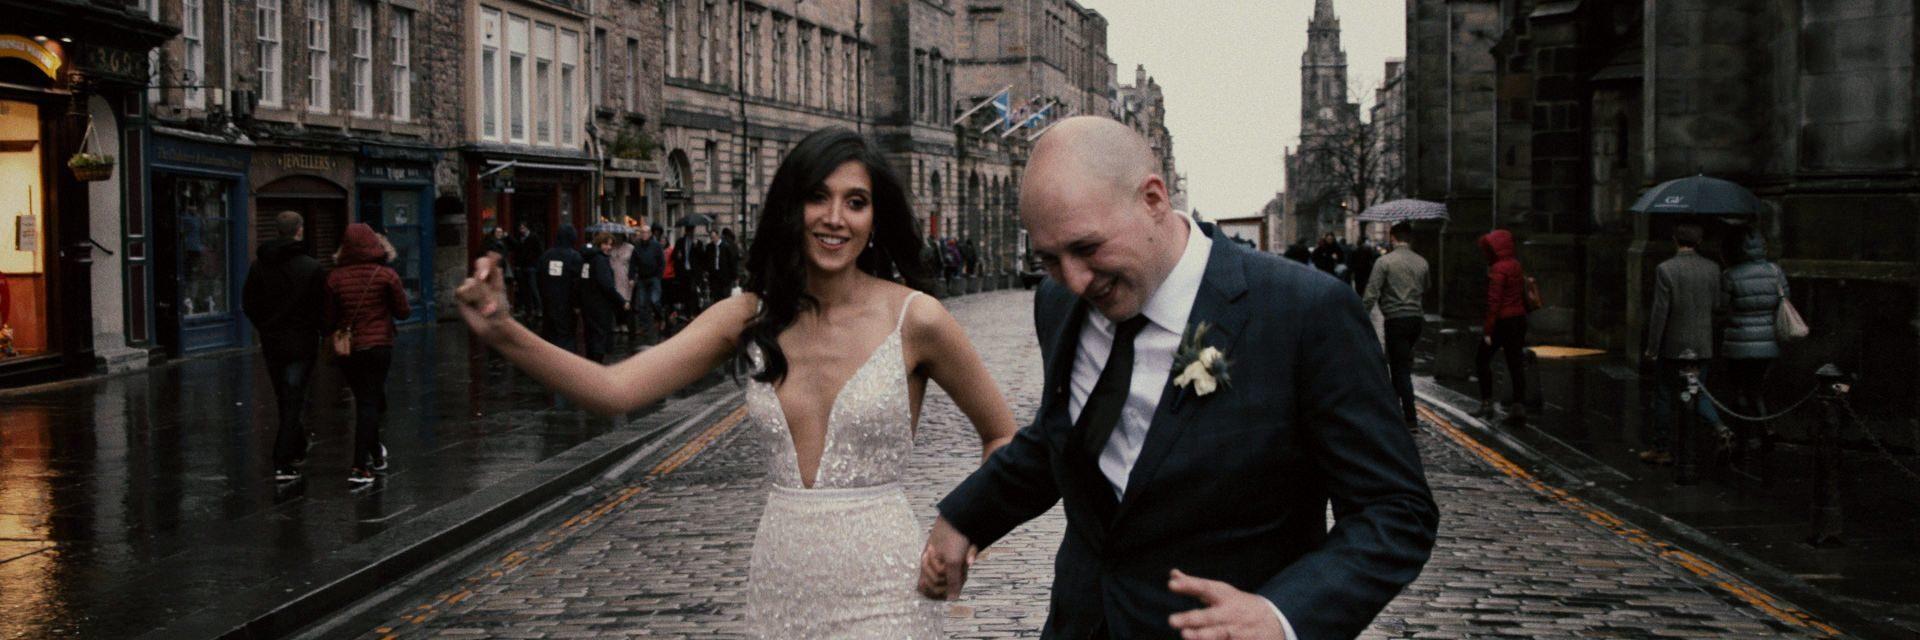 Seychelles-wedding-videographer-cinemate-films-04